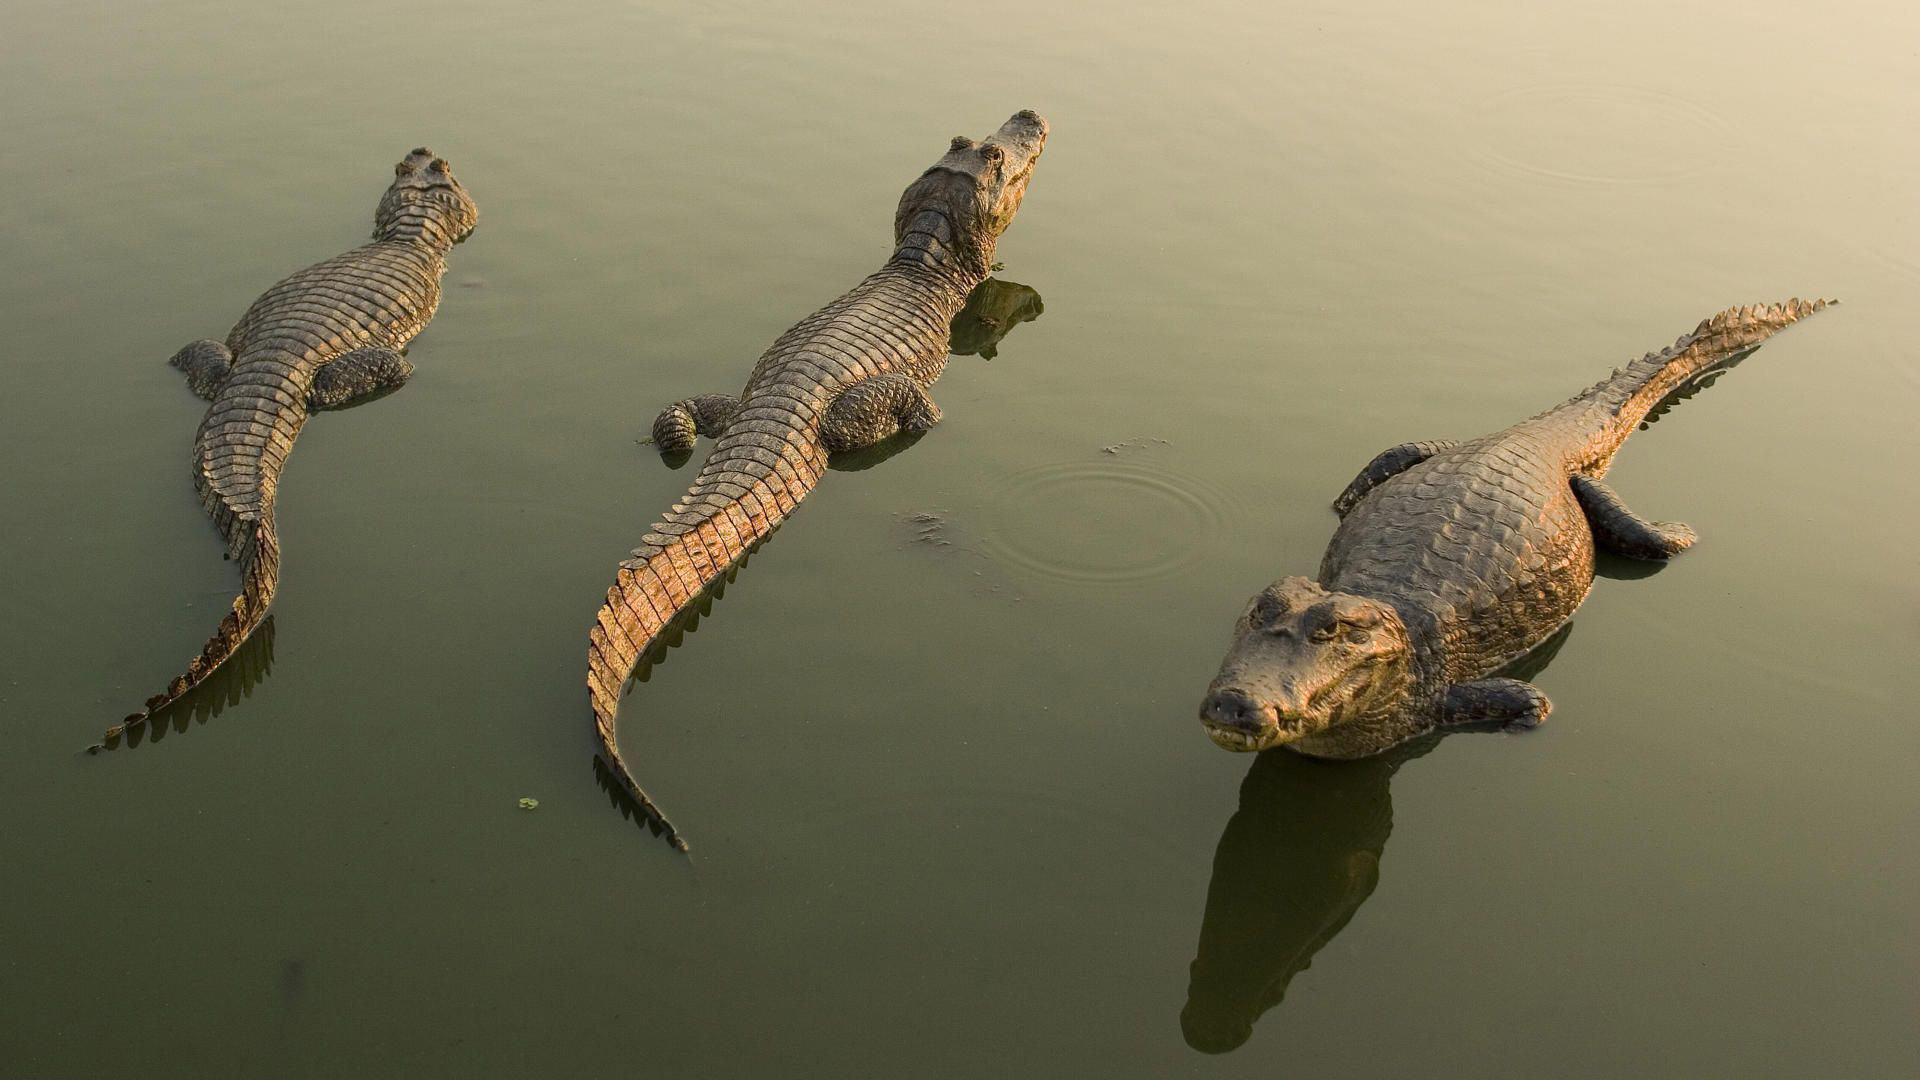 Alligator Widescreen